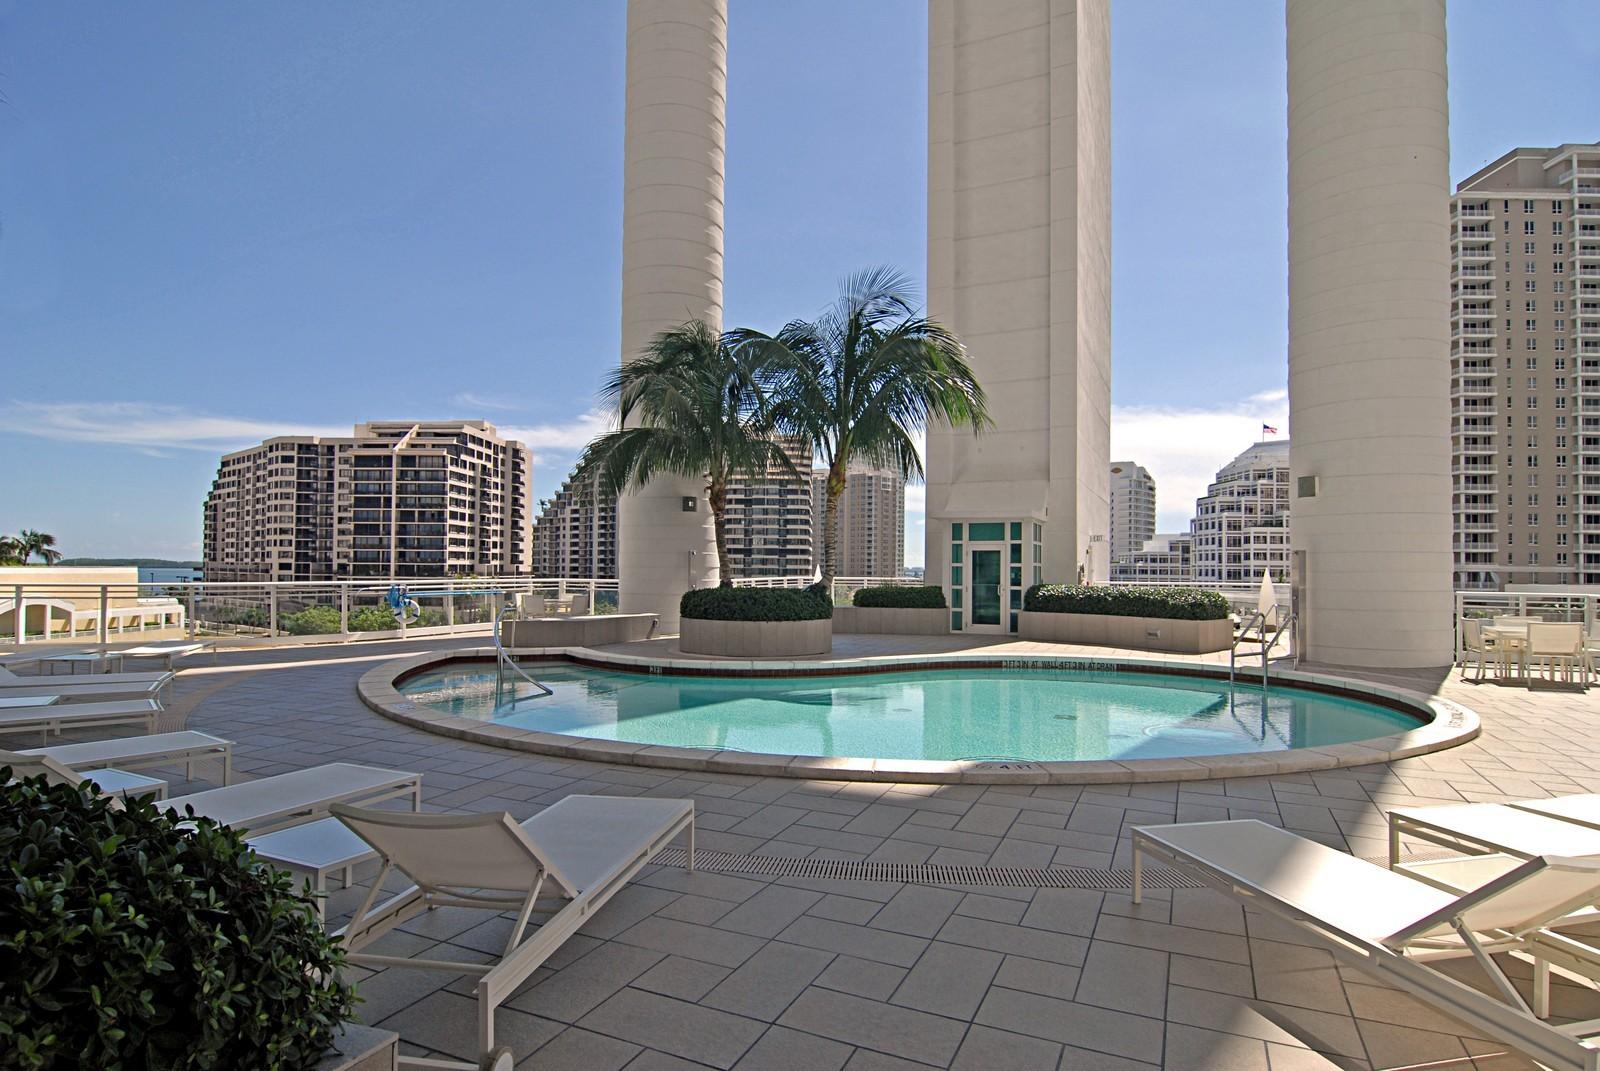 Real Estate Photography - 900 Brickell Key Blvd, Apt 3004, Miami, FL, 33131 - Pool